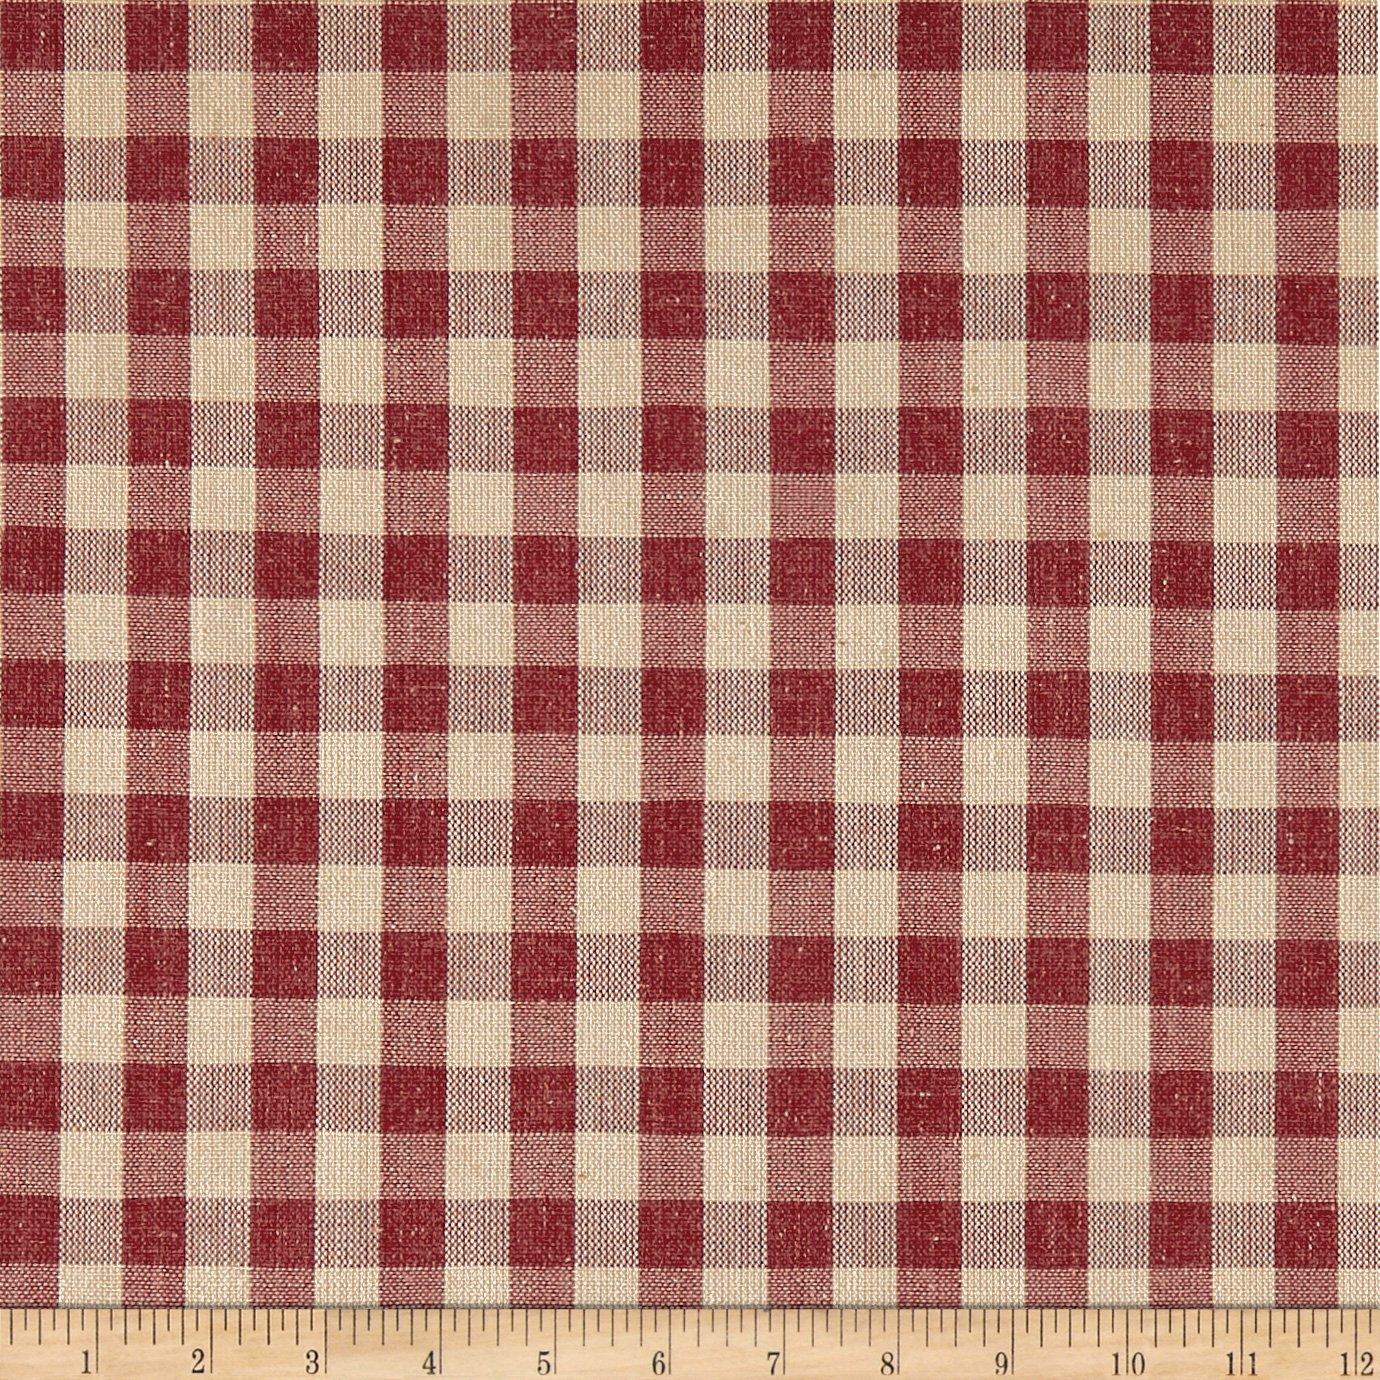 Richloom Fabrics Spruce Canvas, Tomato